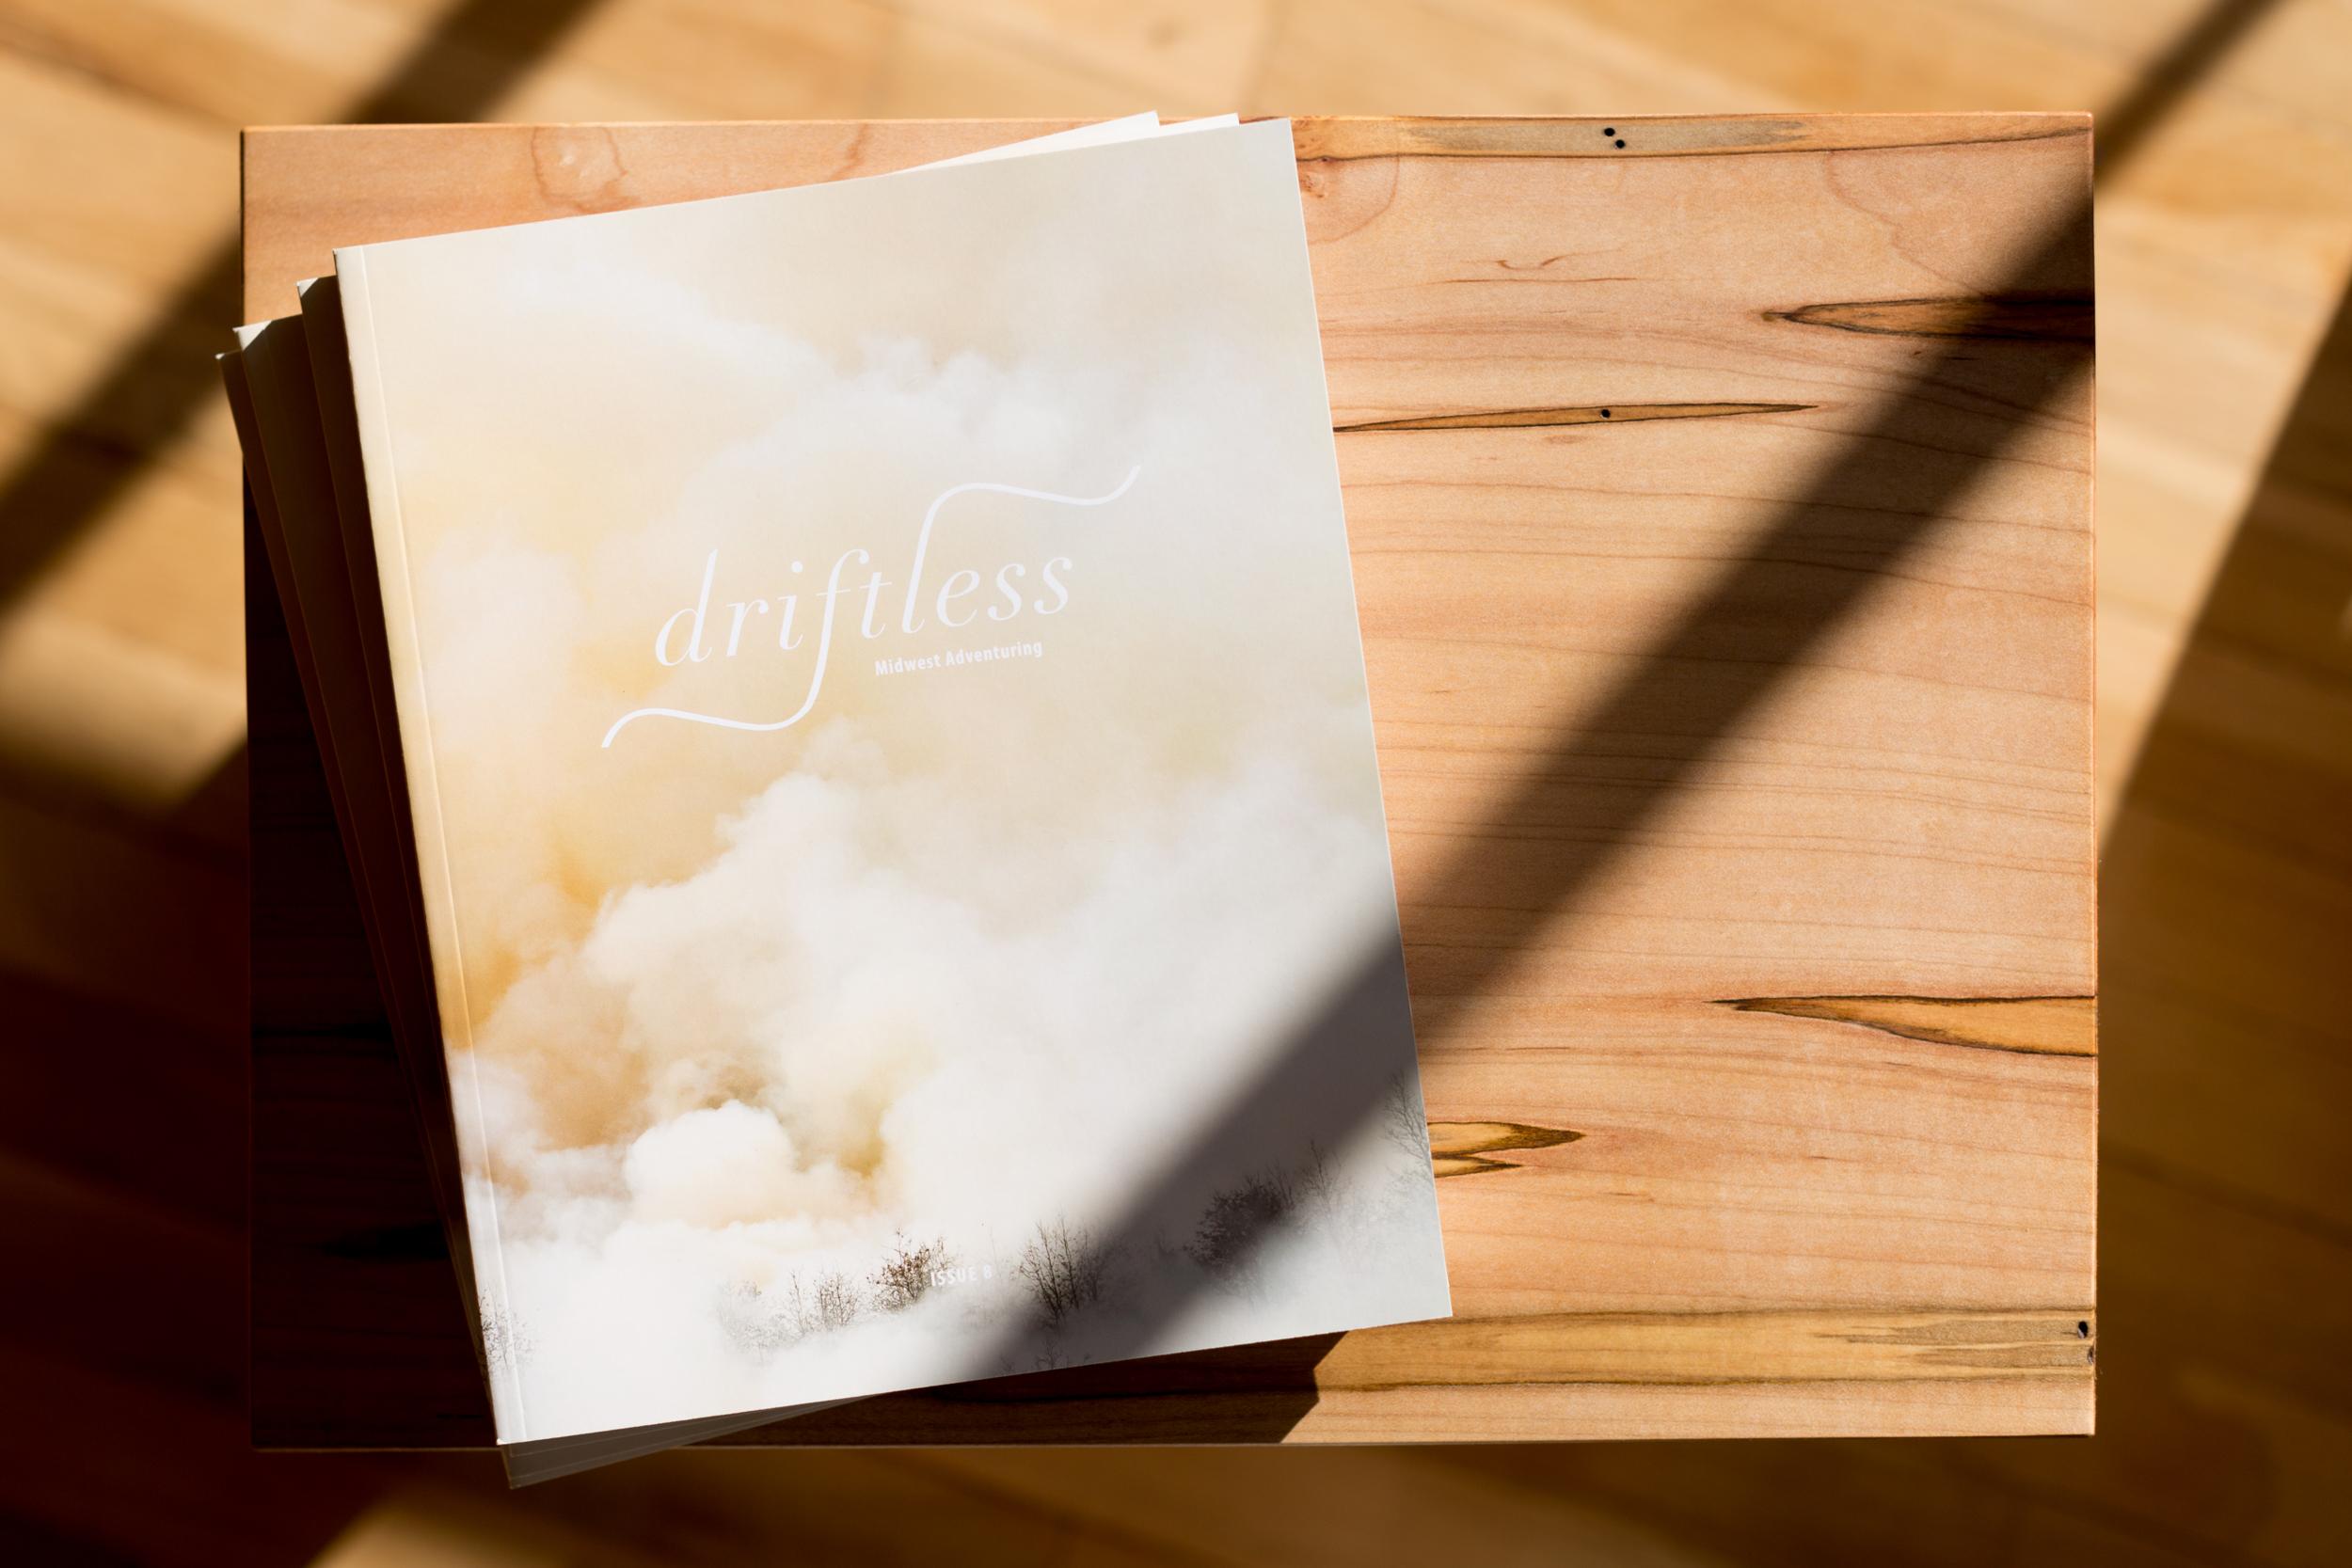 APT_DriftlessMagazineIssue801.jpg